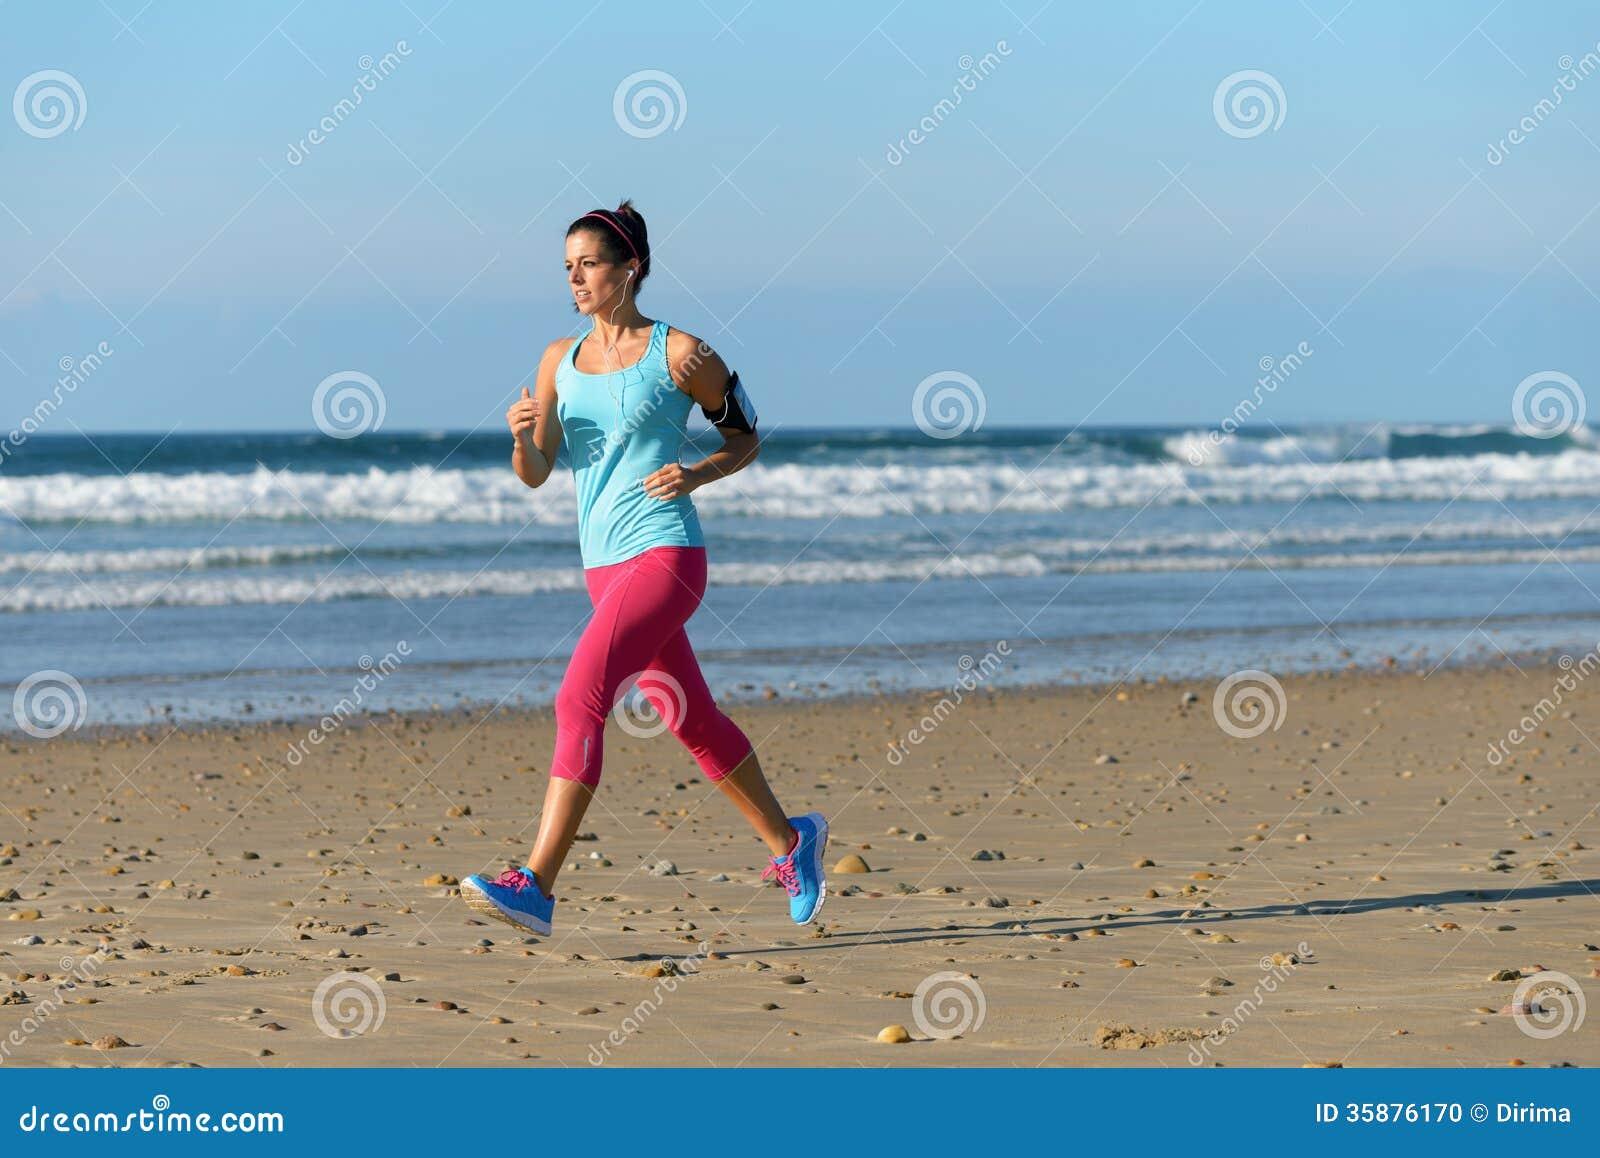 Фото девушки фитнес на пляже 23 фотография